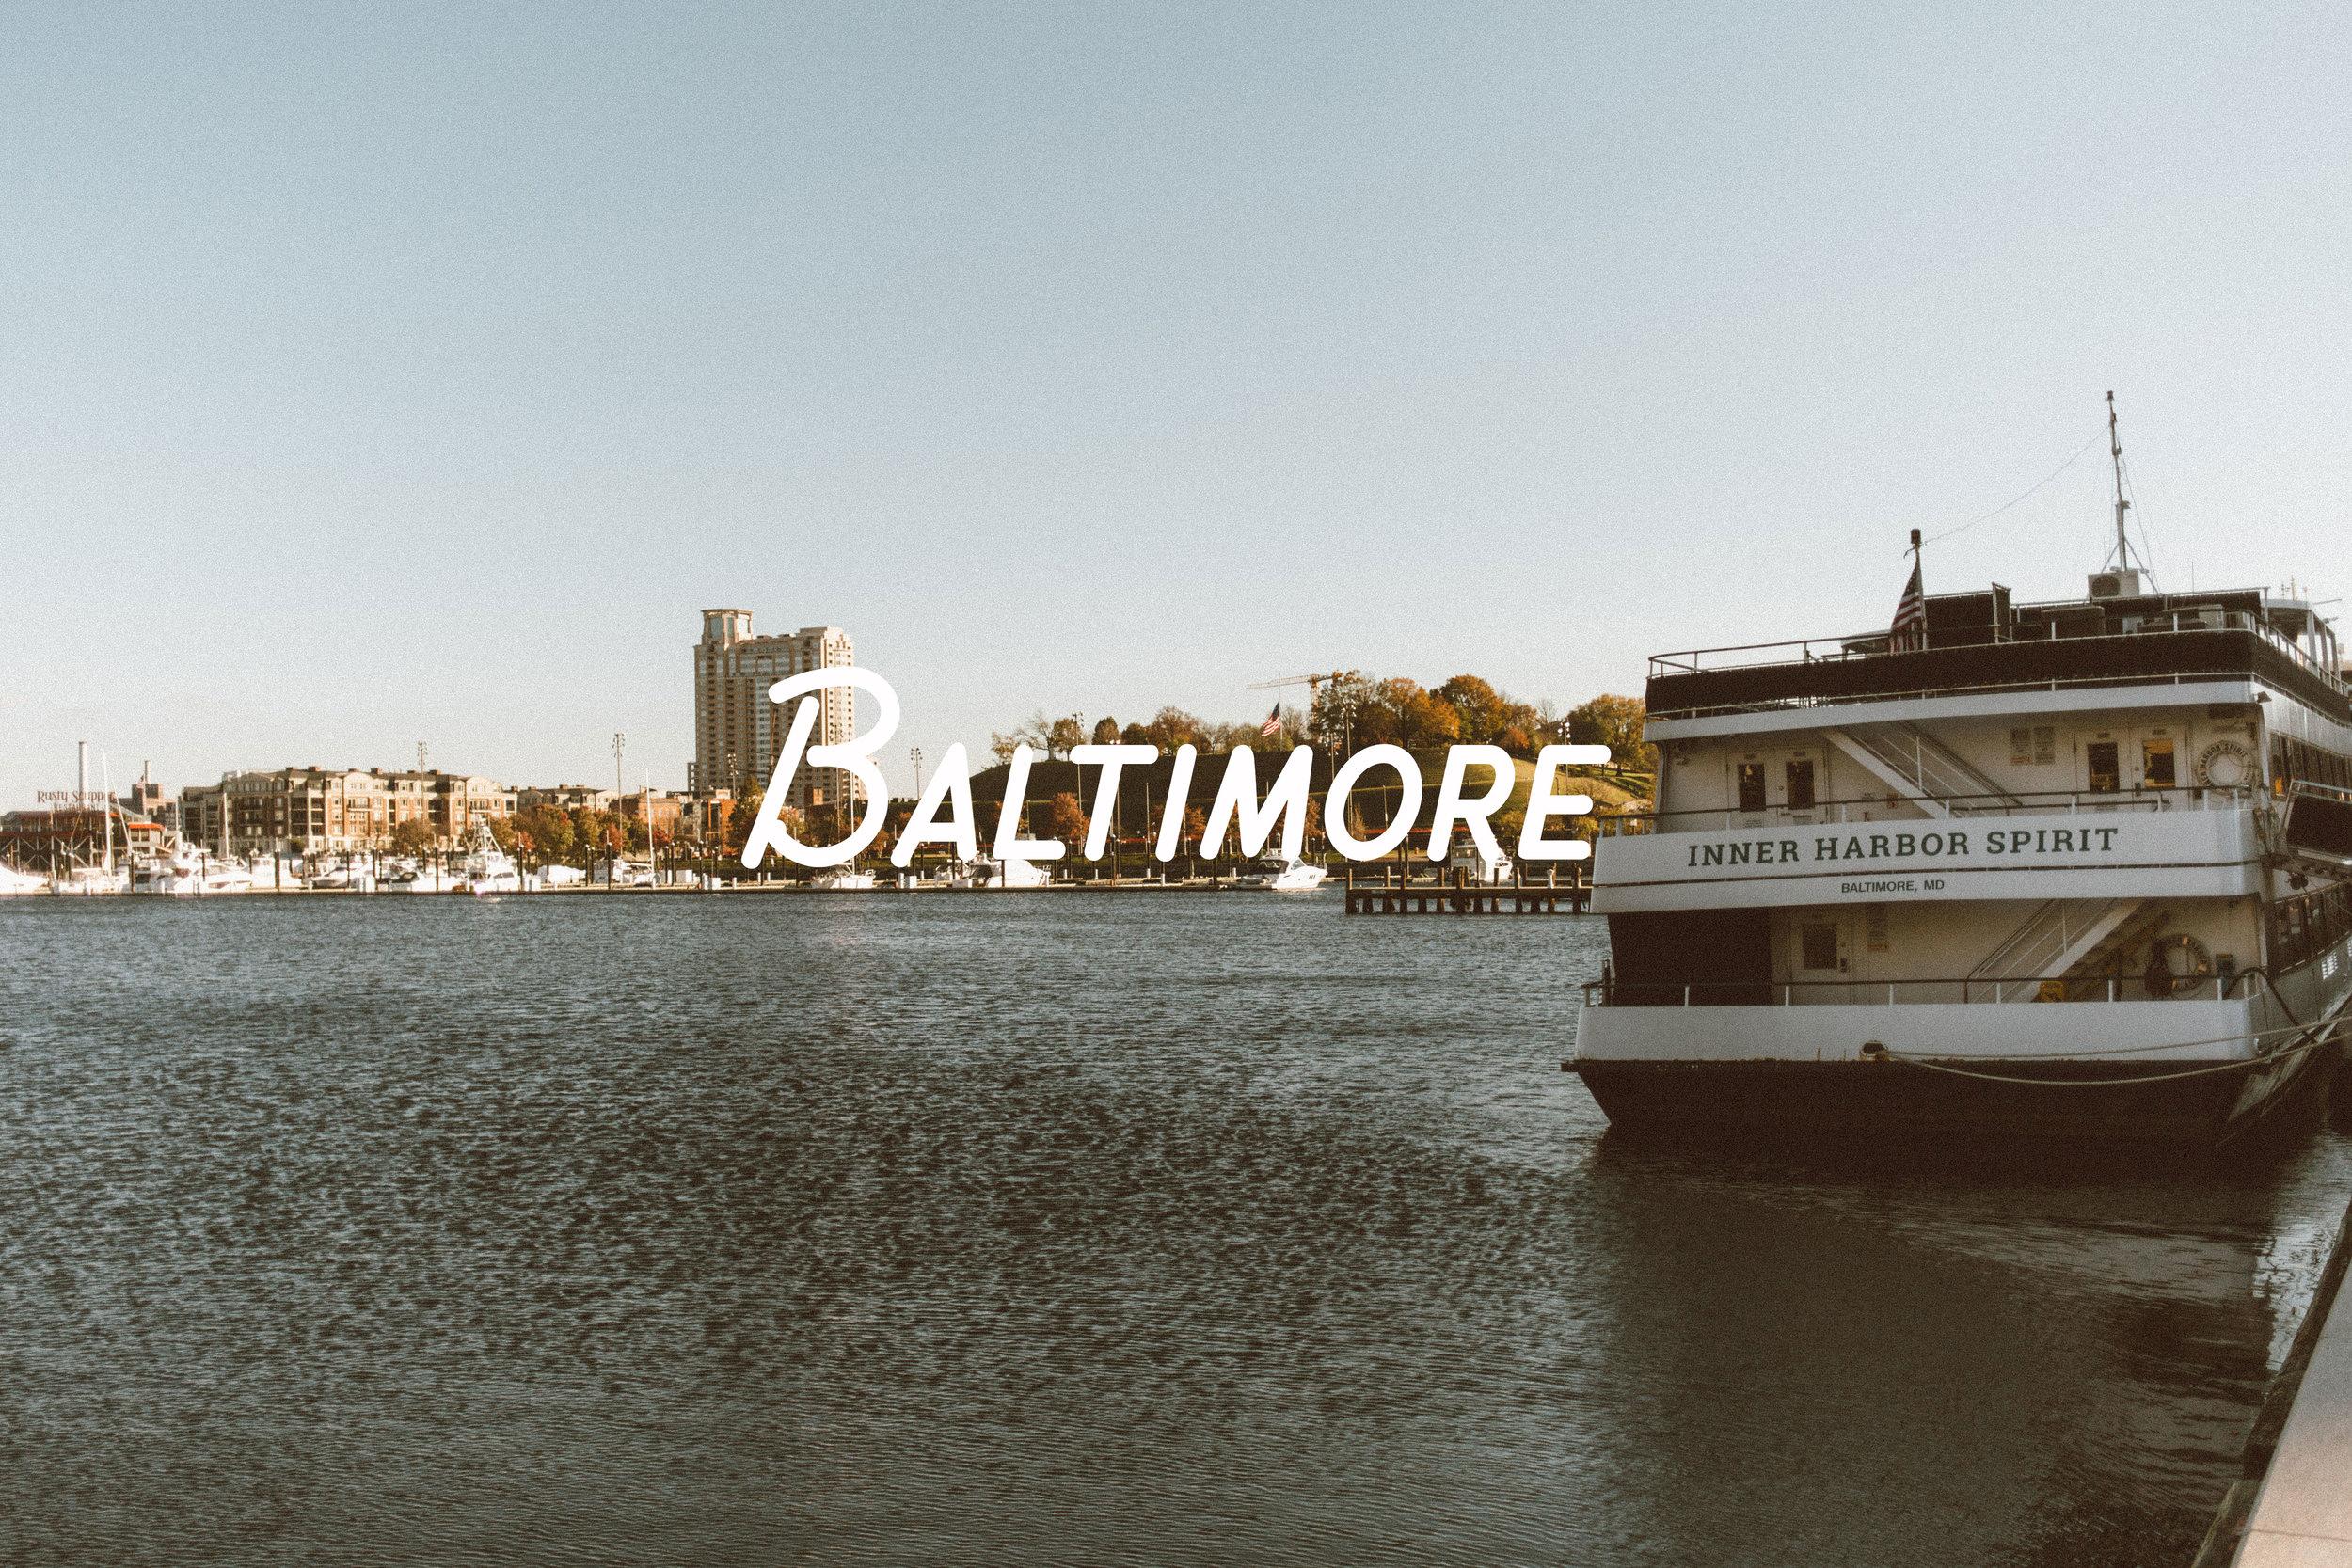 NSR_NYC_Baltimore_Journal_thumbnail-3M1A8316.jpg